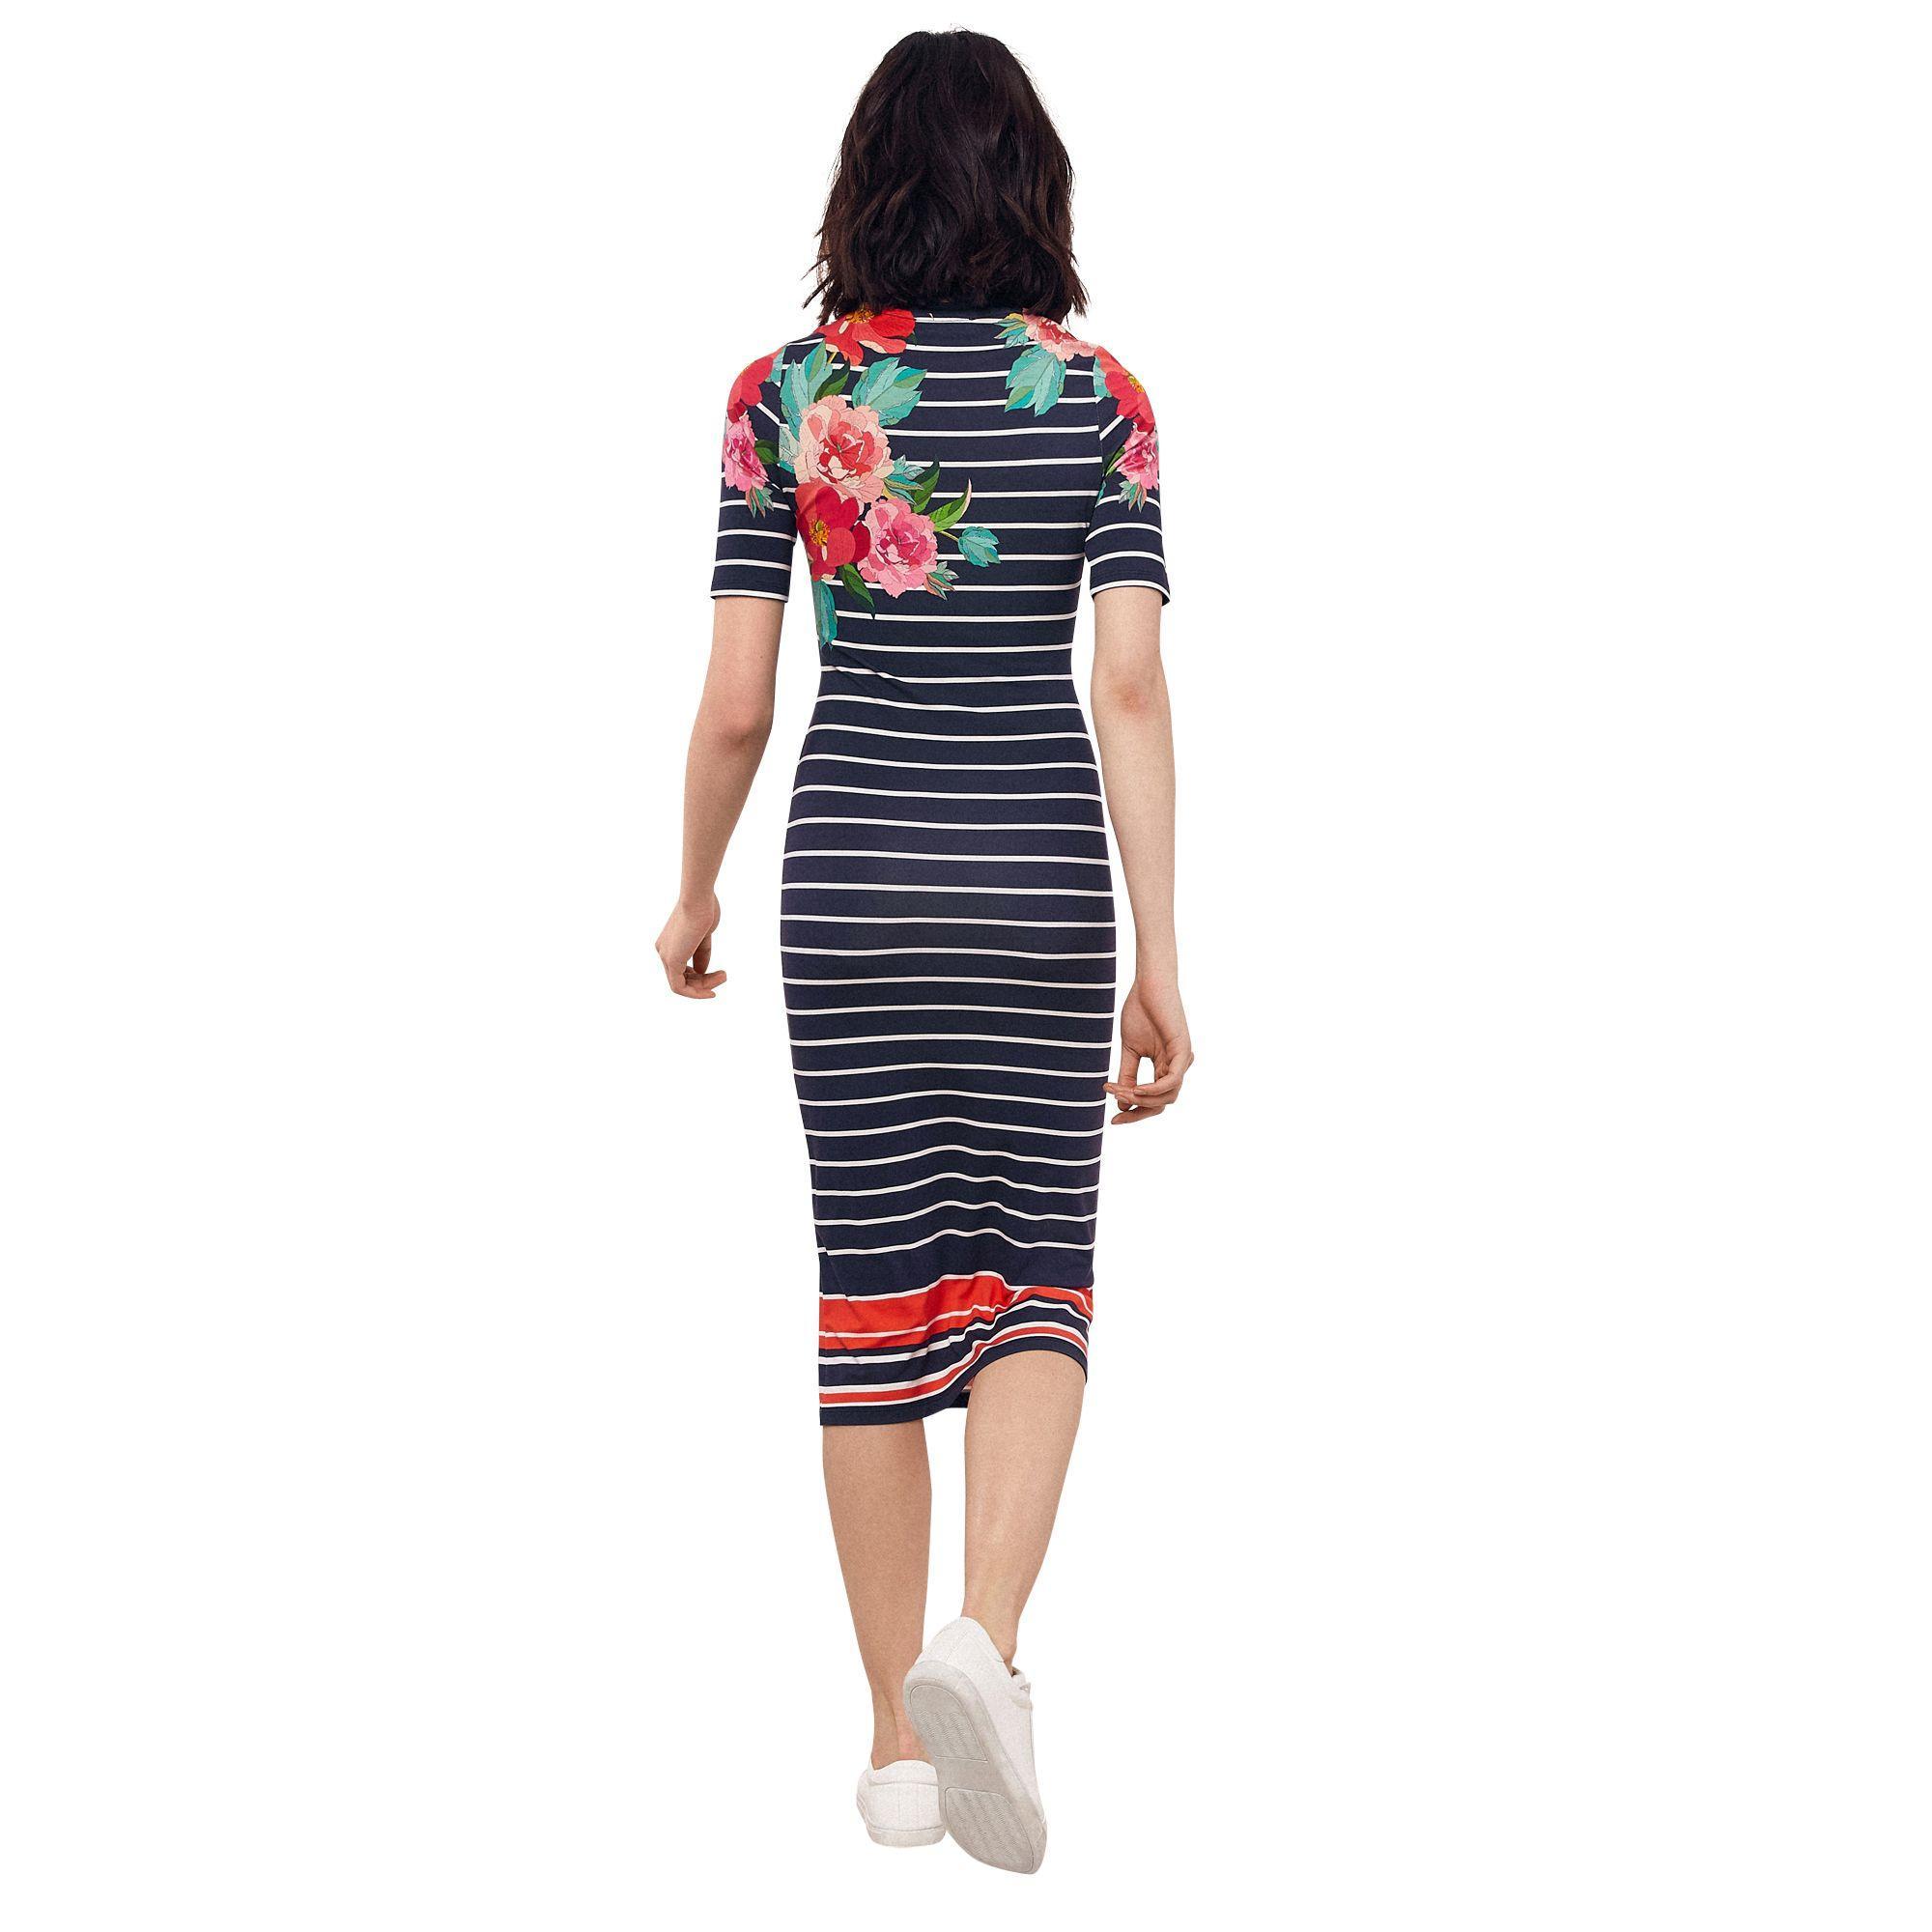 f2108defe2fe Oasis - Multi Blue 'amya' Stripe And Print Tube Dress - Lyst. View  fullscreen